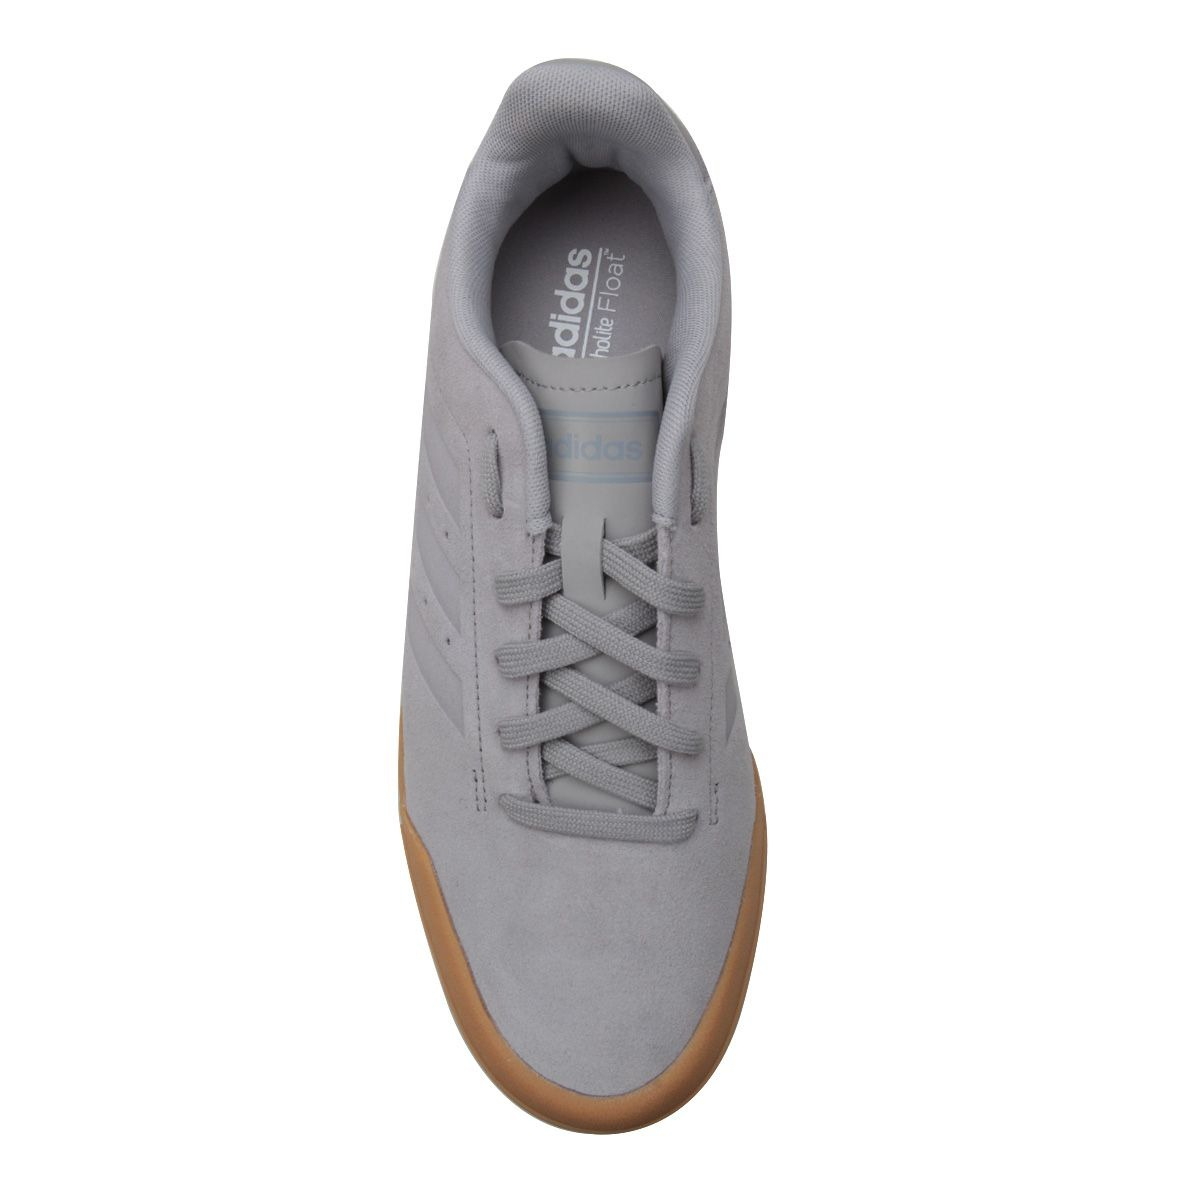 60ee6b46ad8 tênis masculino adidas retro court wild c. Carregando zoom.